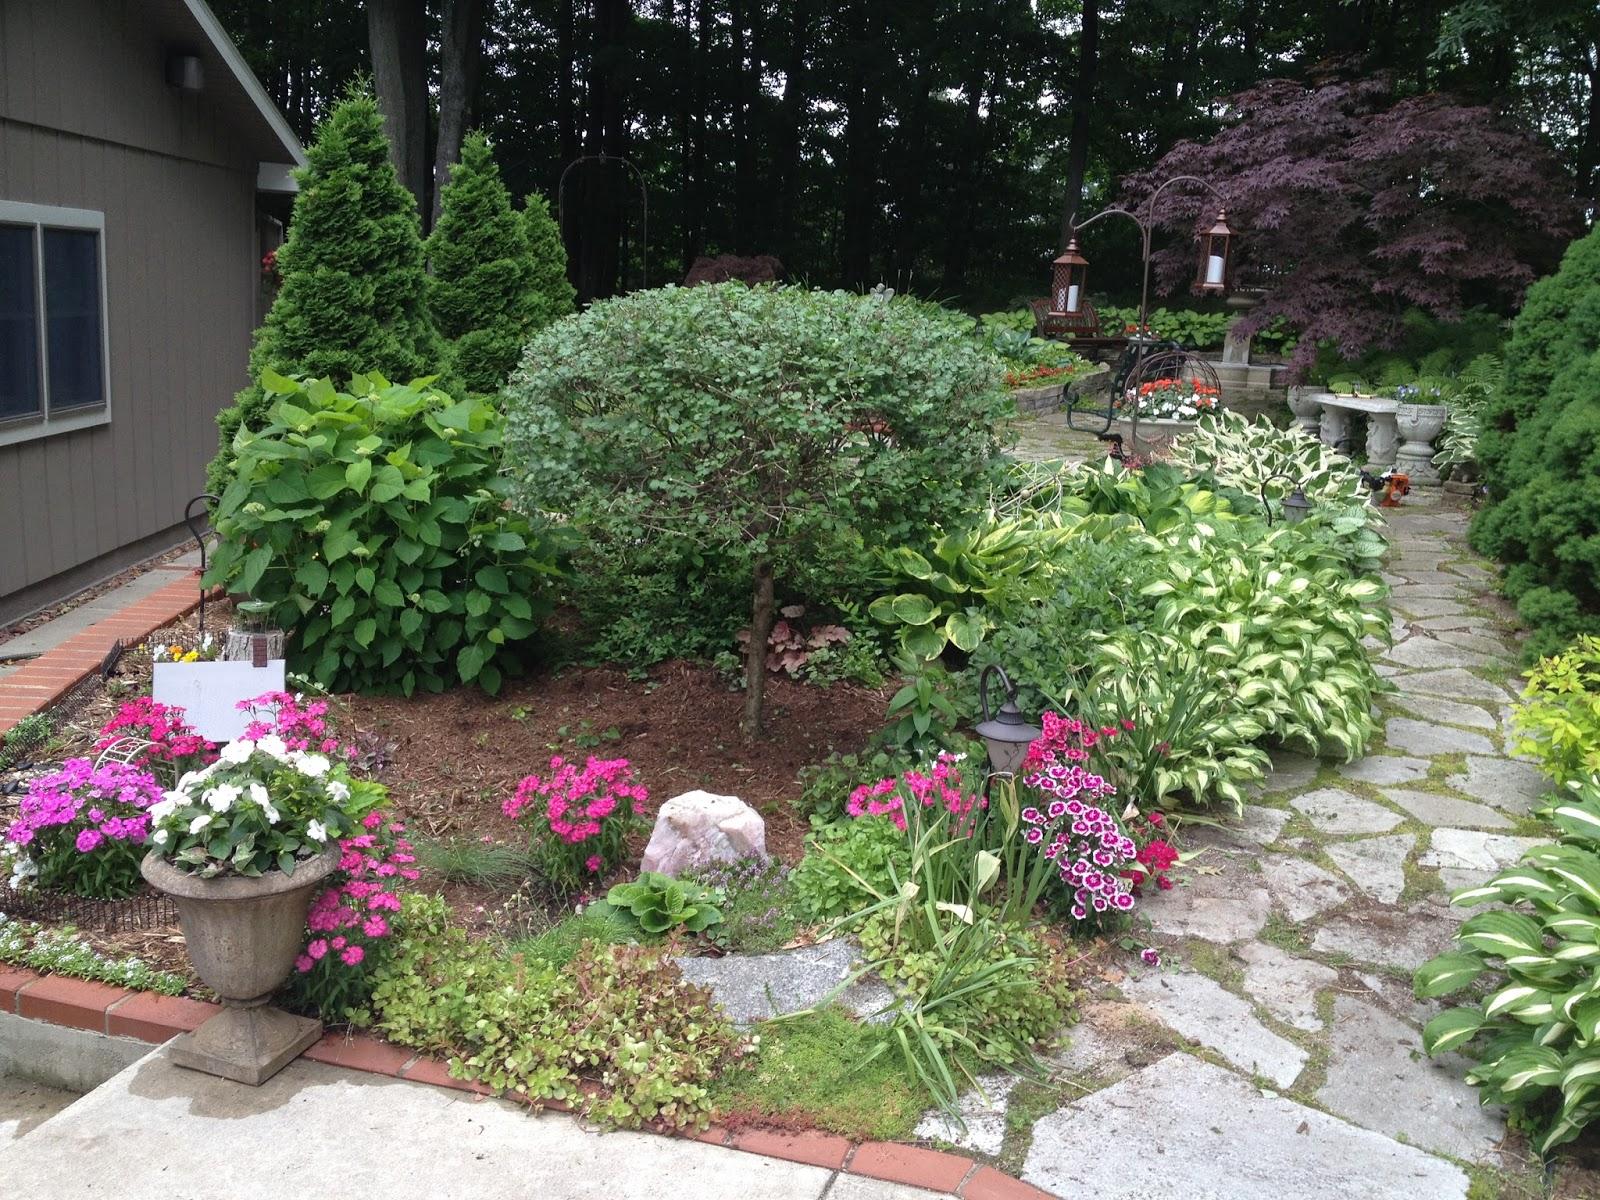 Home And Gardening With Liz Rock Garden Sedum And Whites Flowers